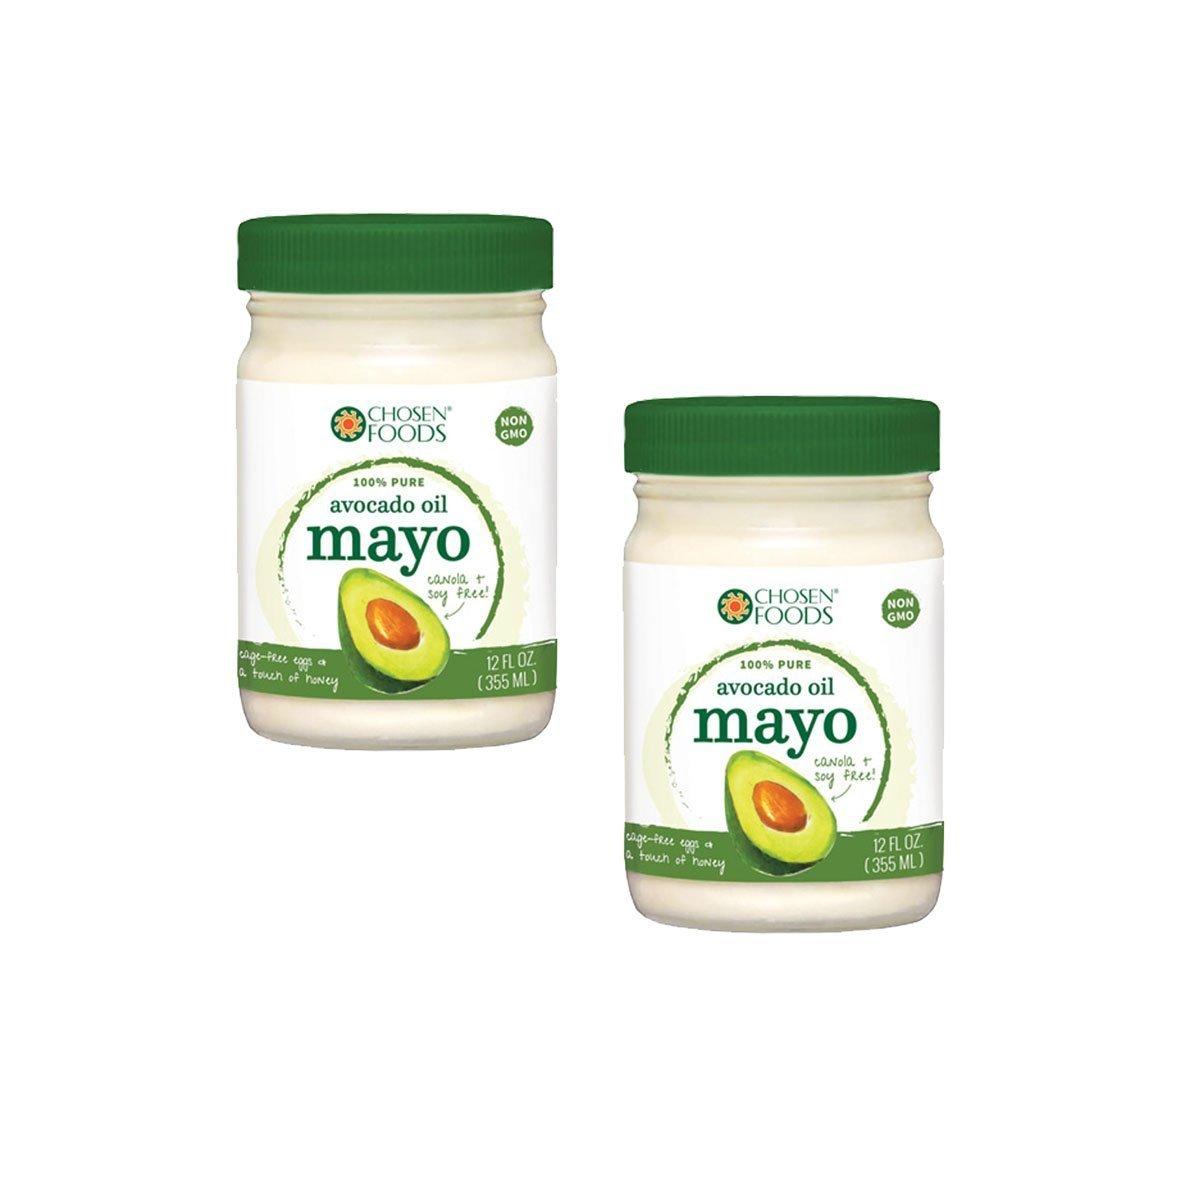 Chosen Foods 100% Pure Avocado Oil Mayo Non GMO - Cage Free Eggs - Soy Free - 12OZ - 2 PACK - KOSHER